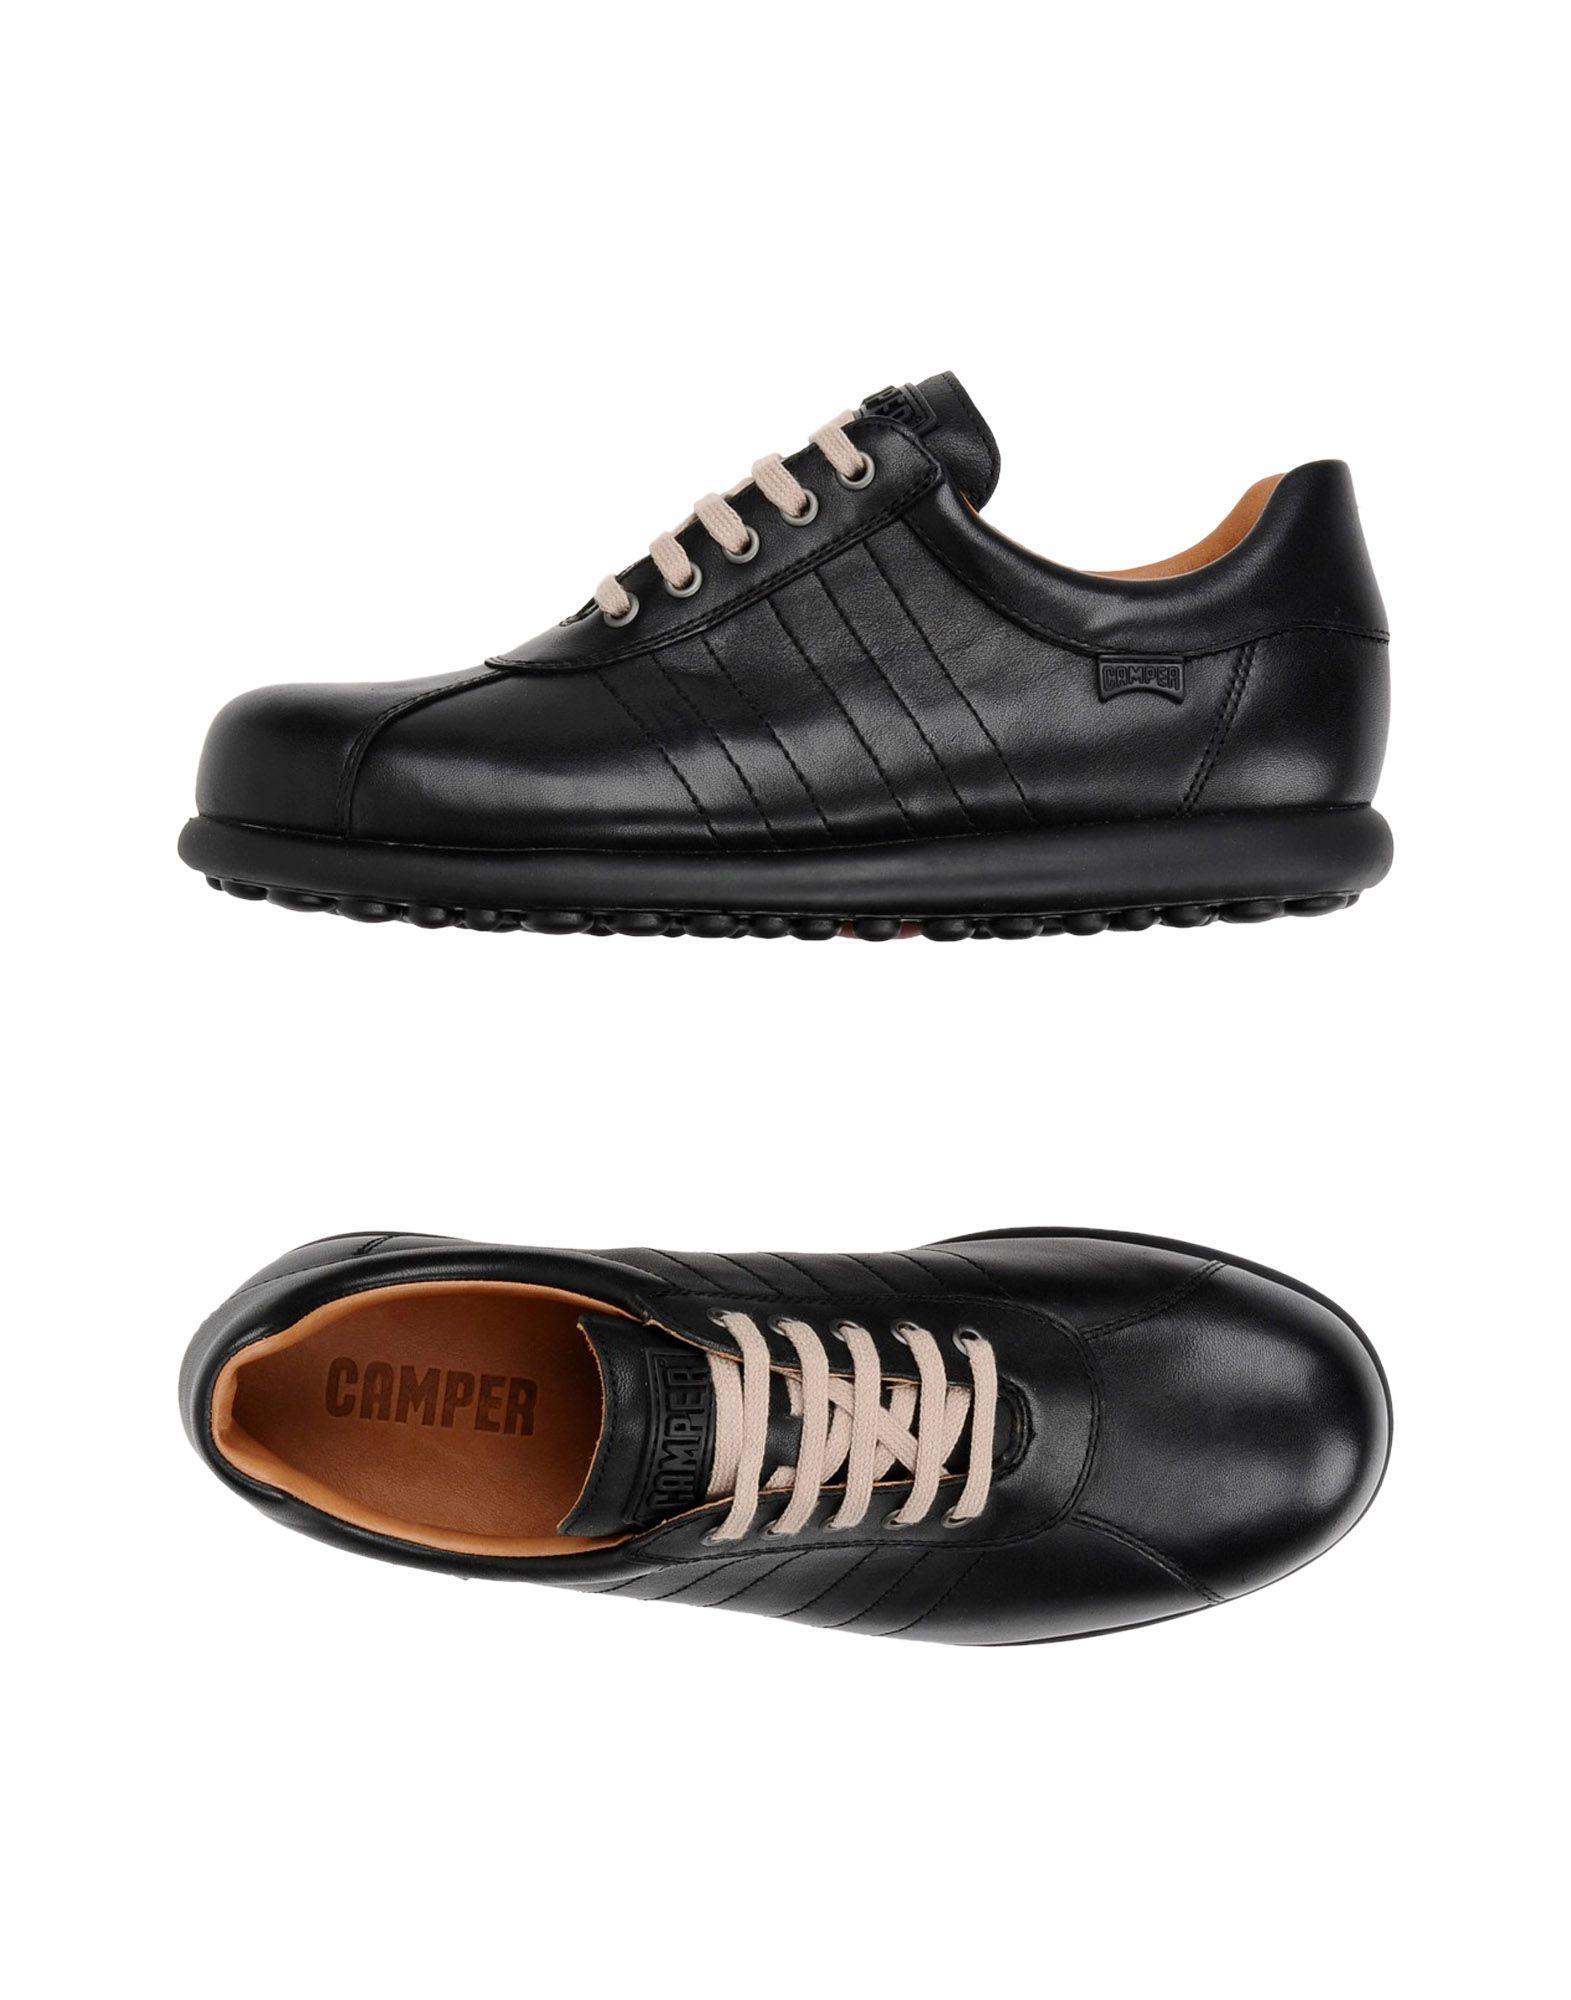 Camper Sneakers Herren  11366663SM Gute Qualität beliebte Schuhe